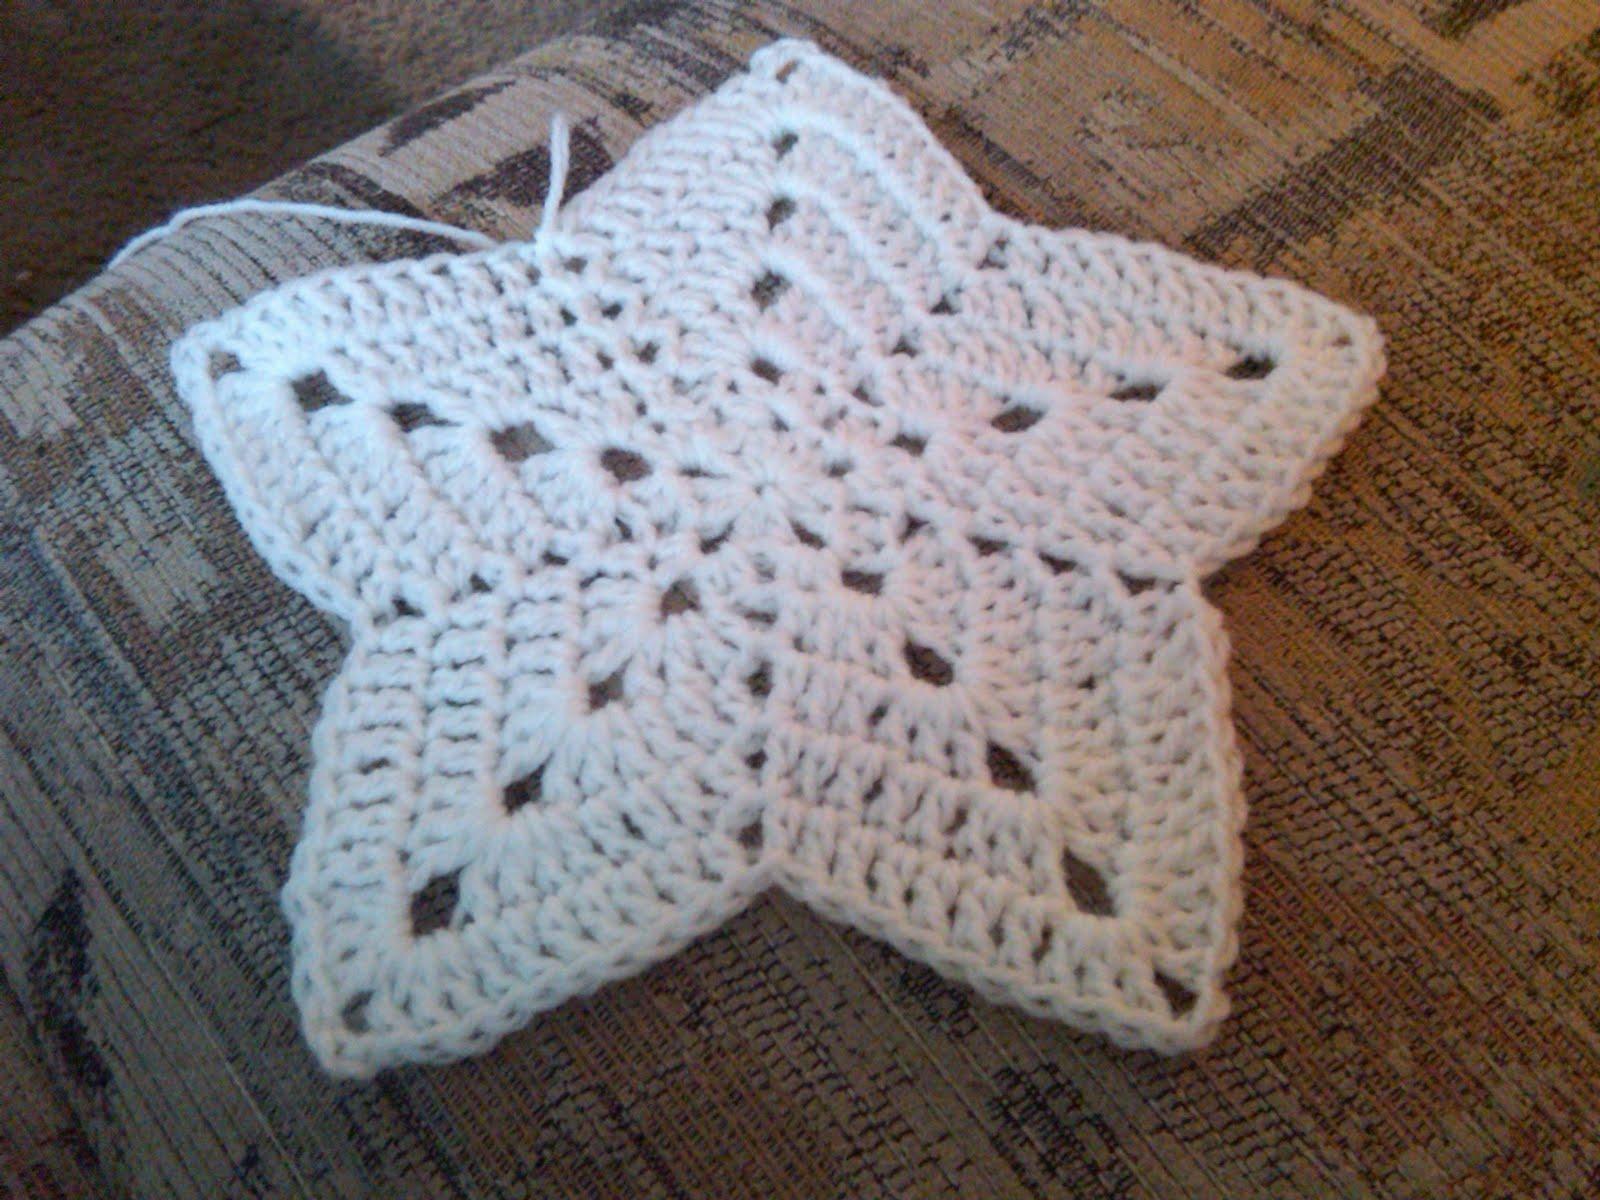 Crochet Granny Star - The Stitchin Mommy